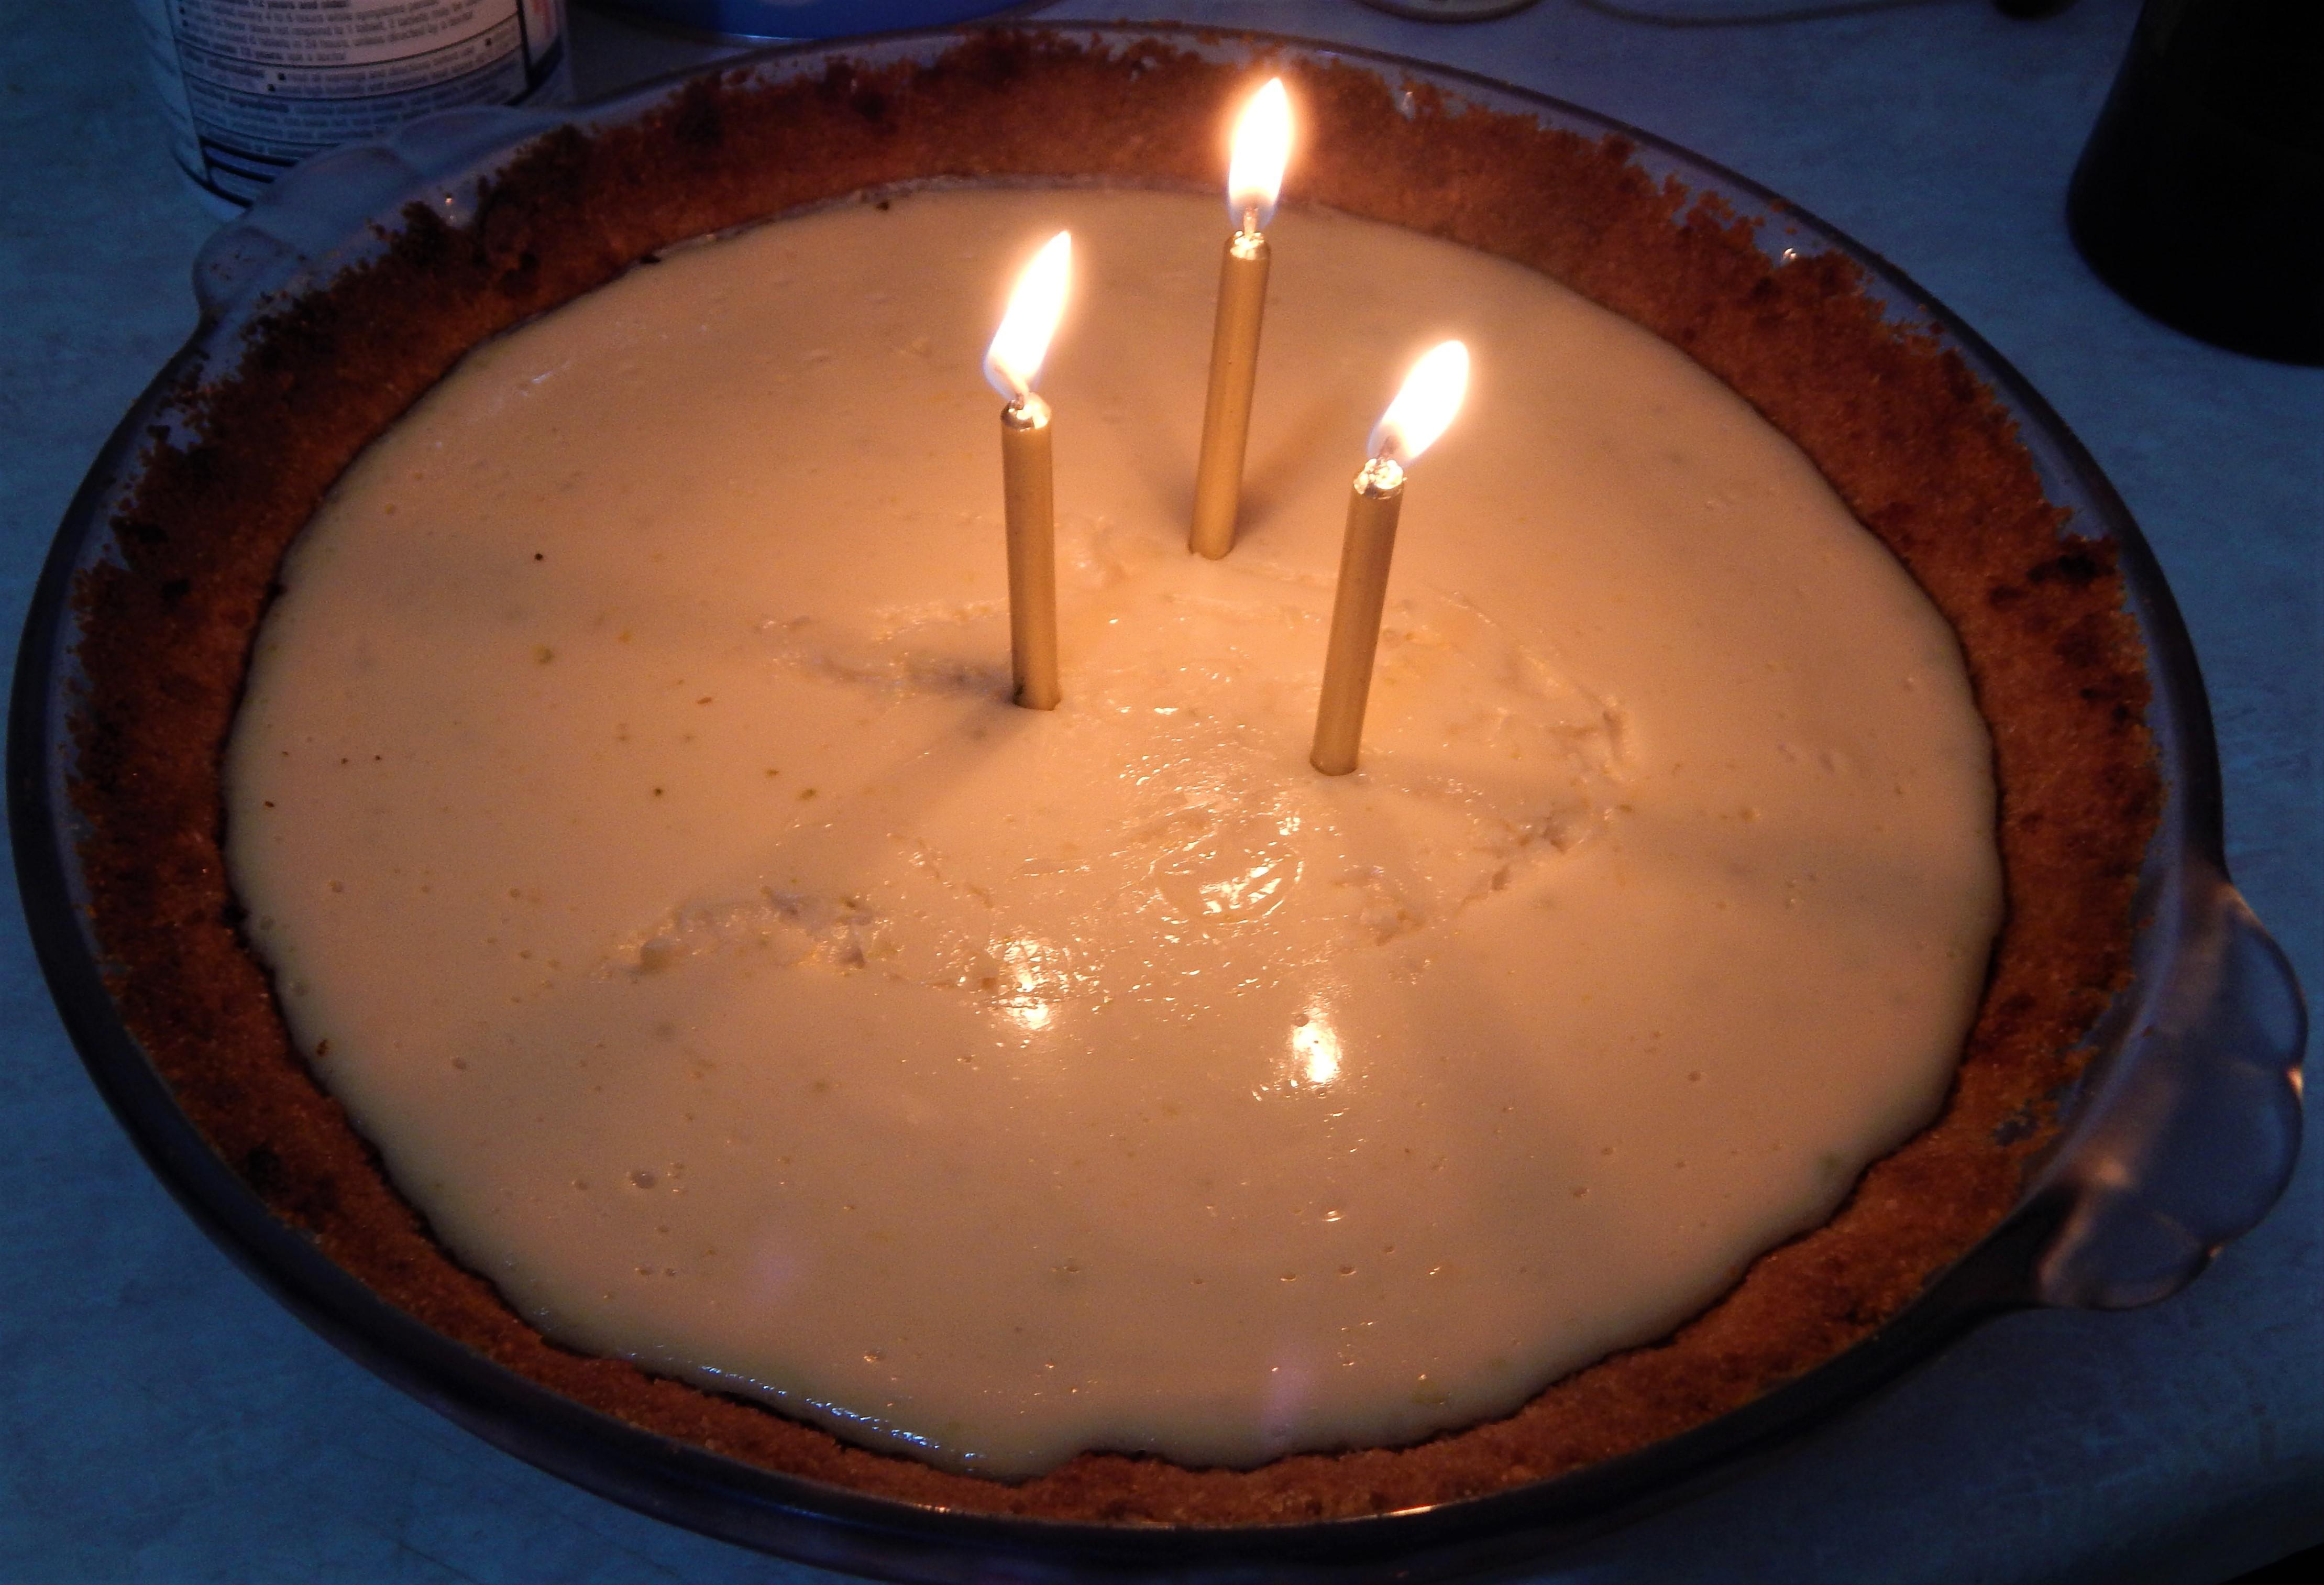 Phoenician's Key Lime Pie Heather Landon